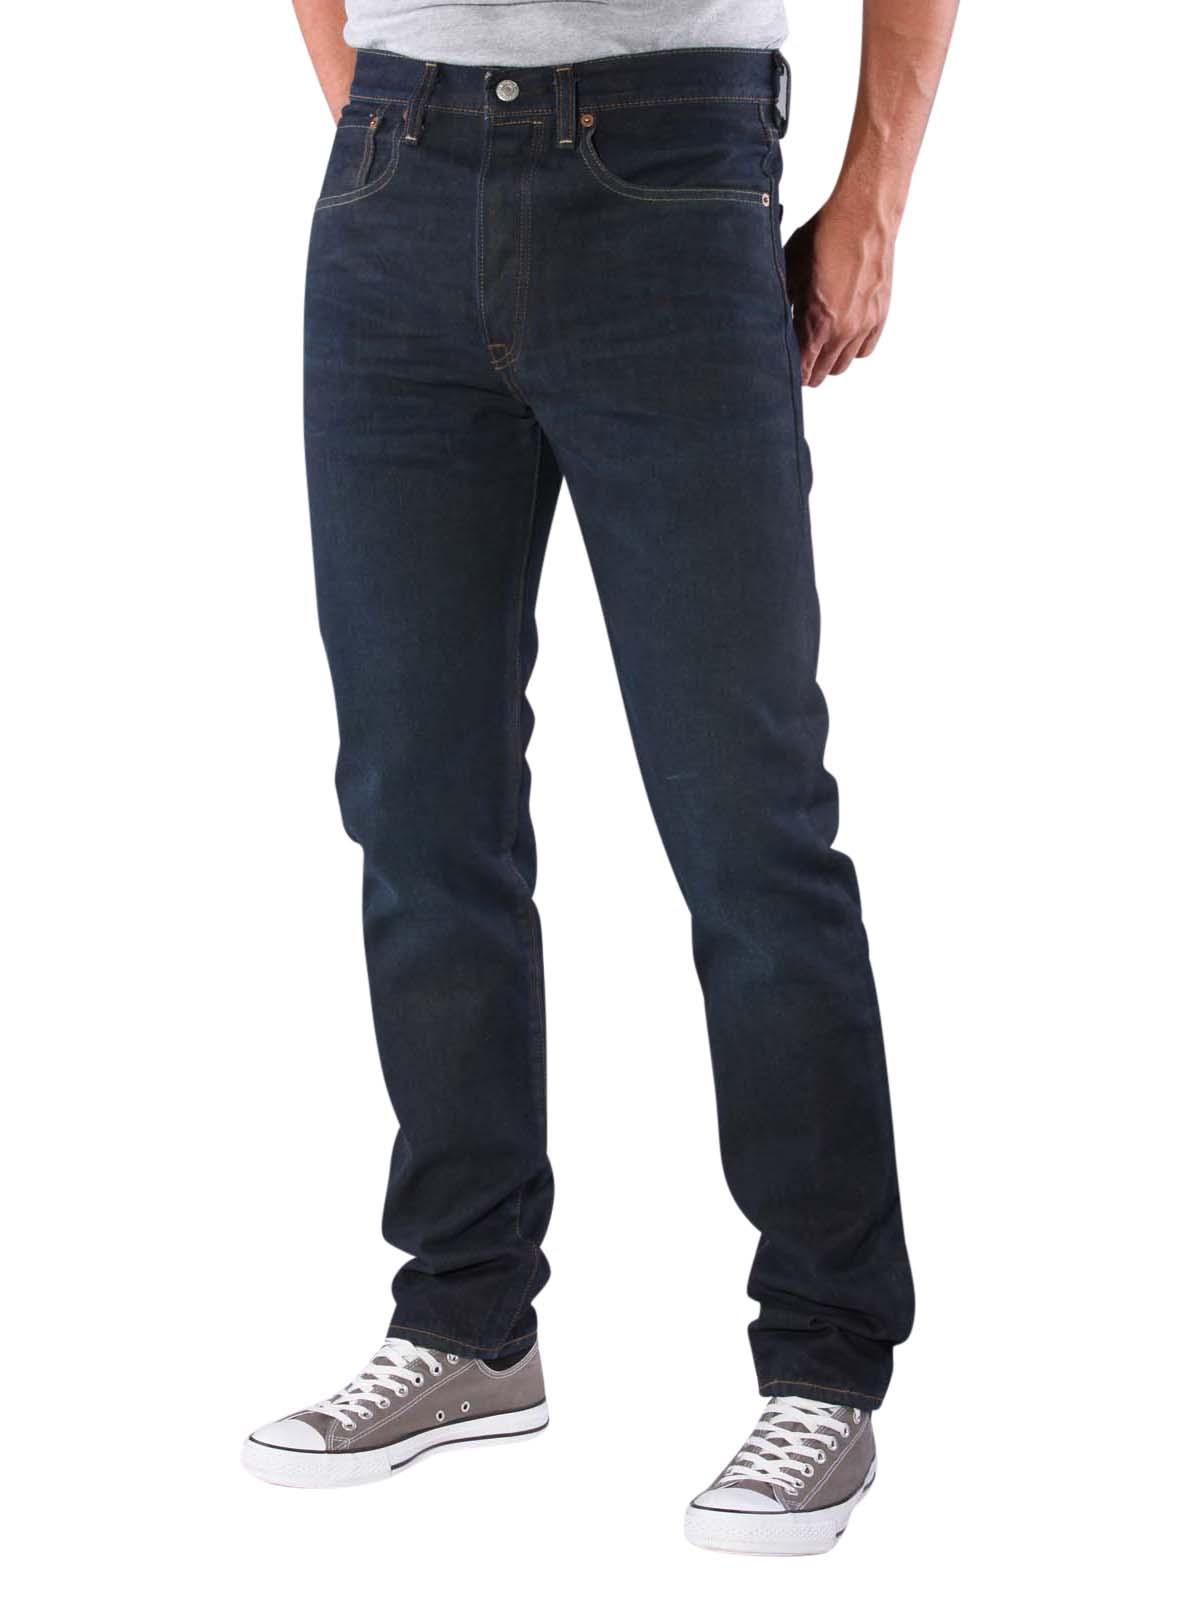 Levi's 501 CT Jeans harrison W29L34